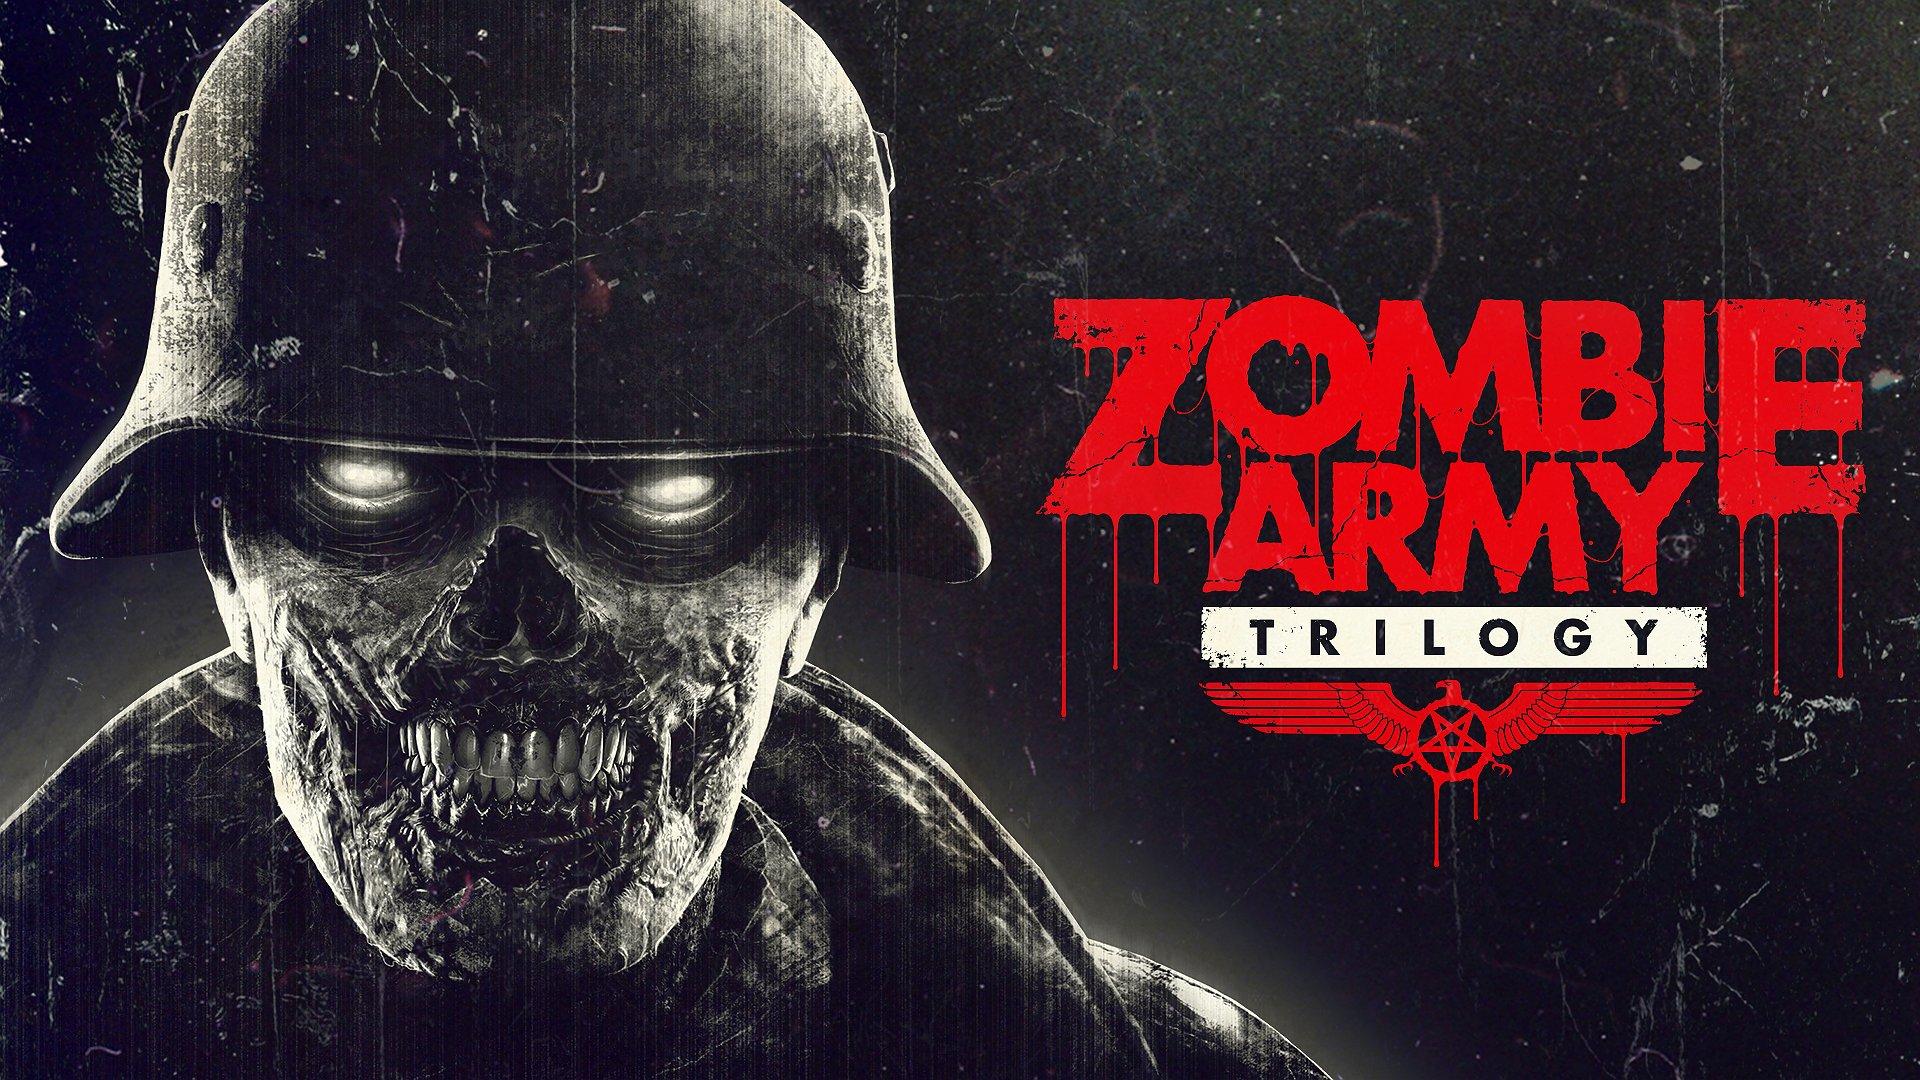 NAZI ZOMBIE ARMY TRILOGY survival horror shooter dar action 1zatrilogy 1920x1080